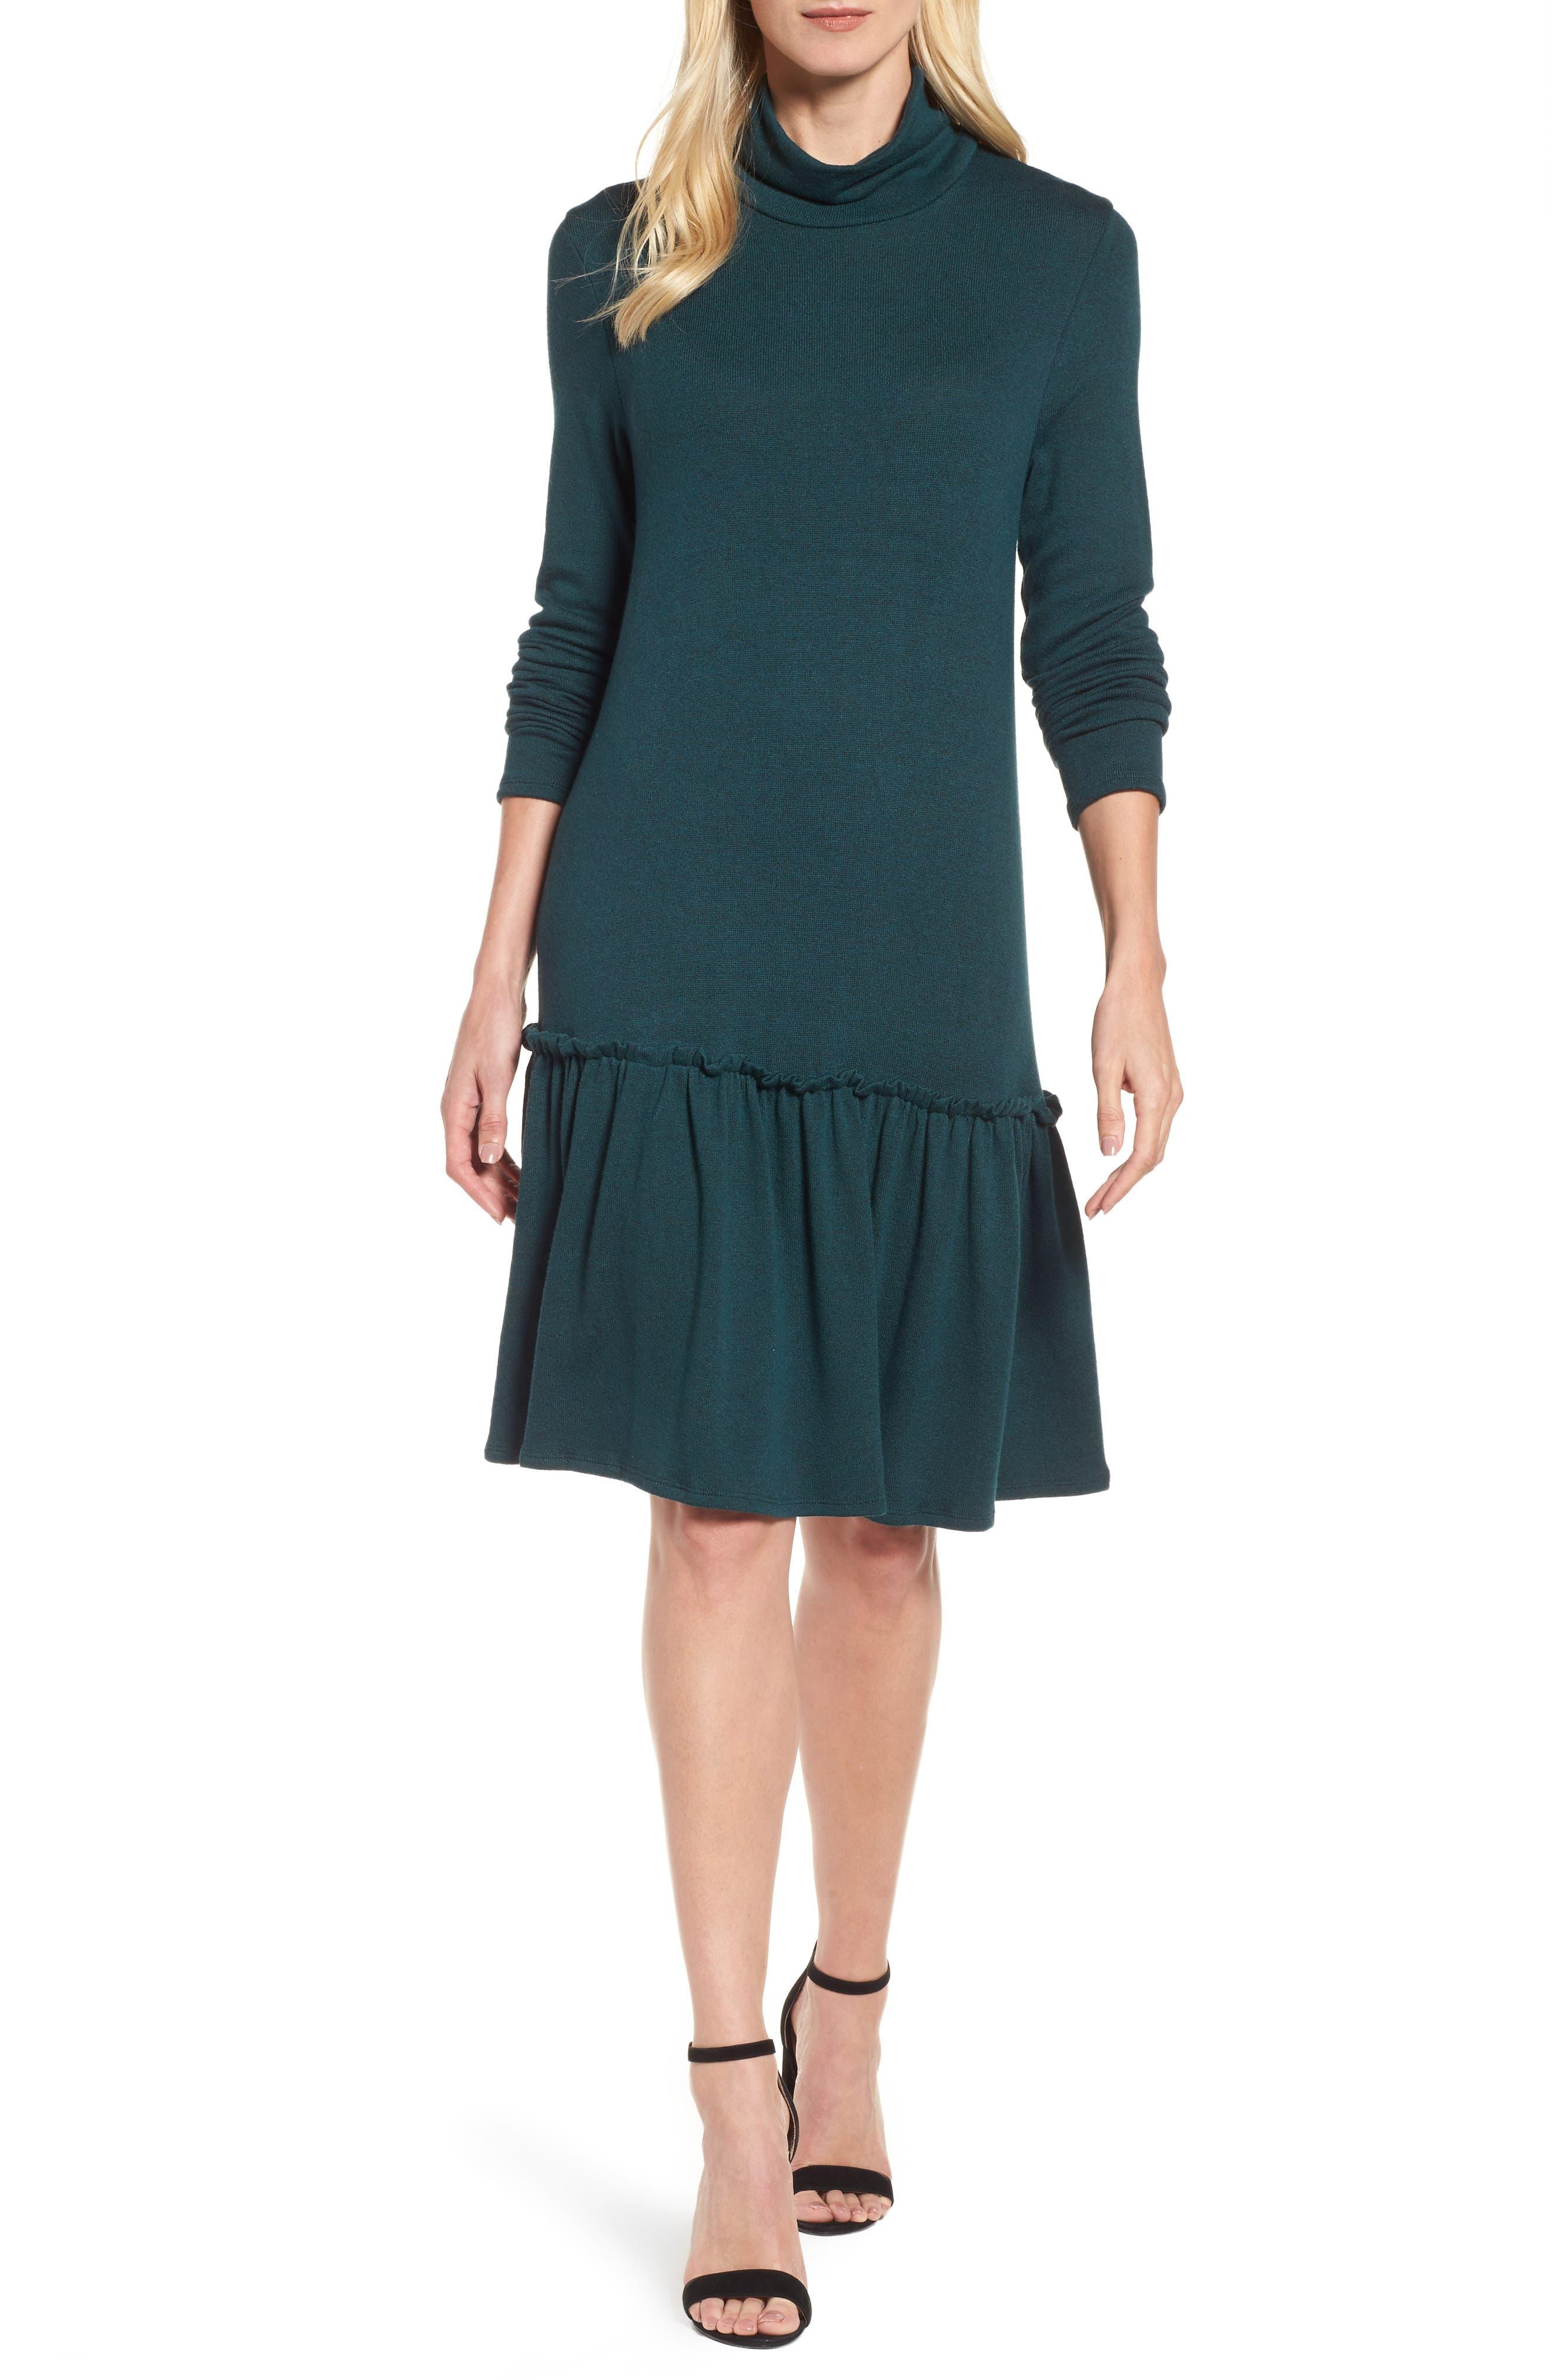 Alternate Image 1 Selected - Halogen® Ruffle Hem Turtleneck Dress